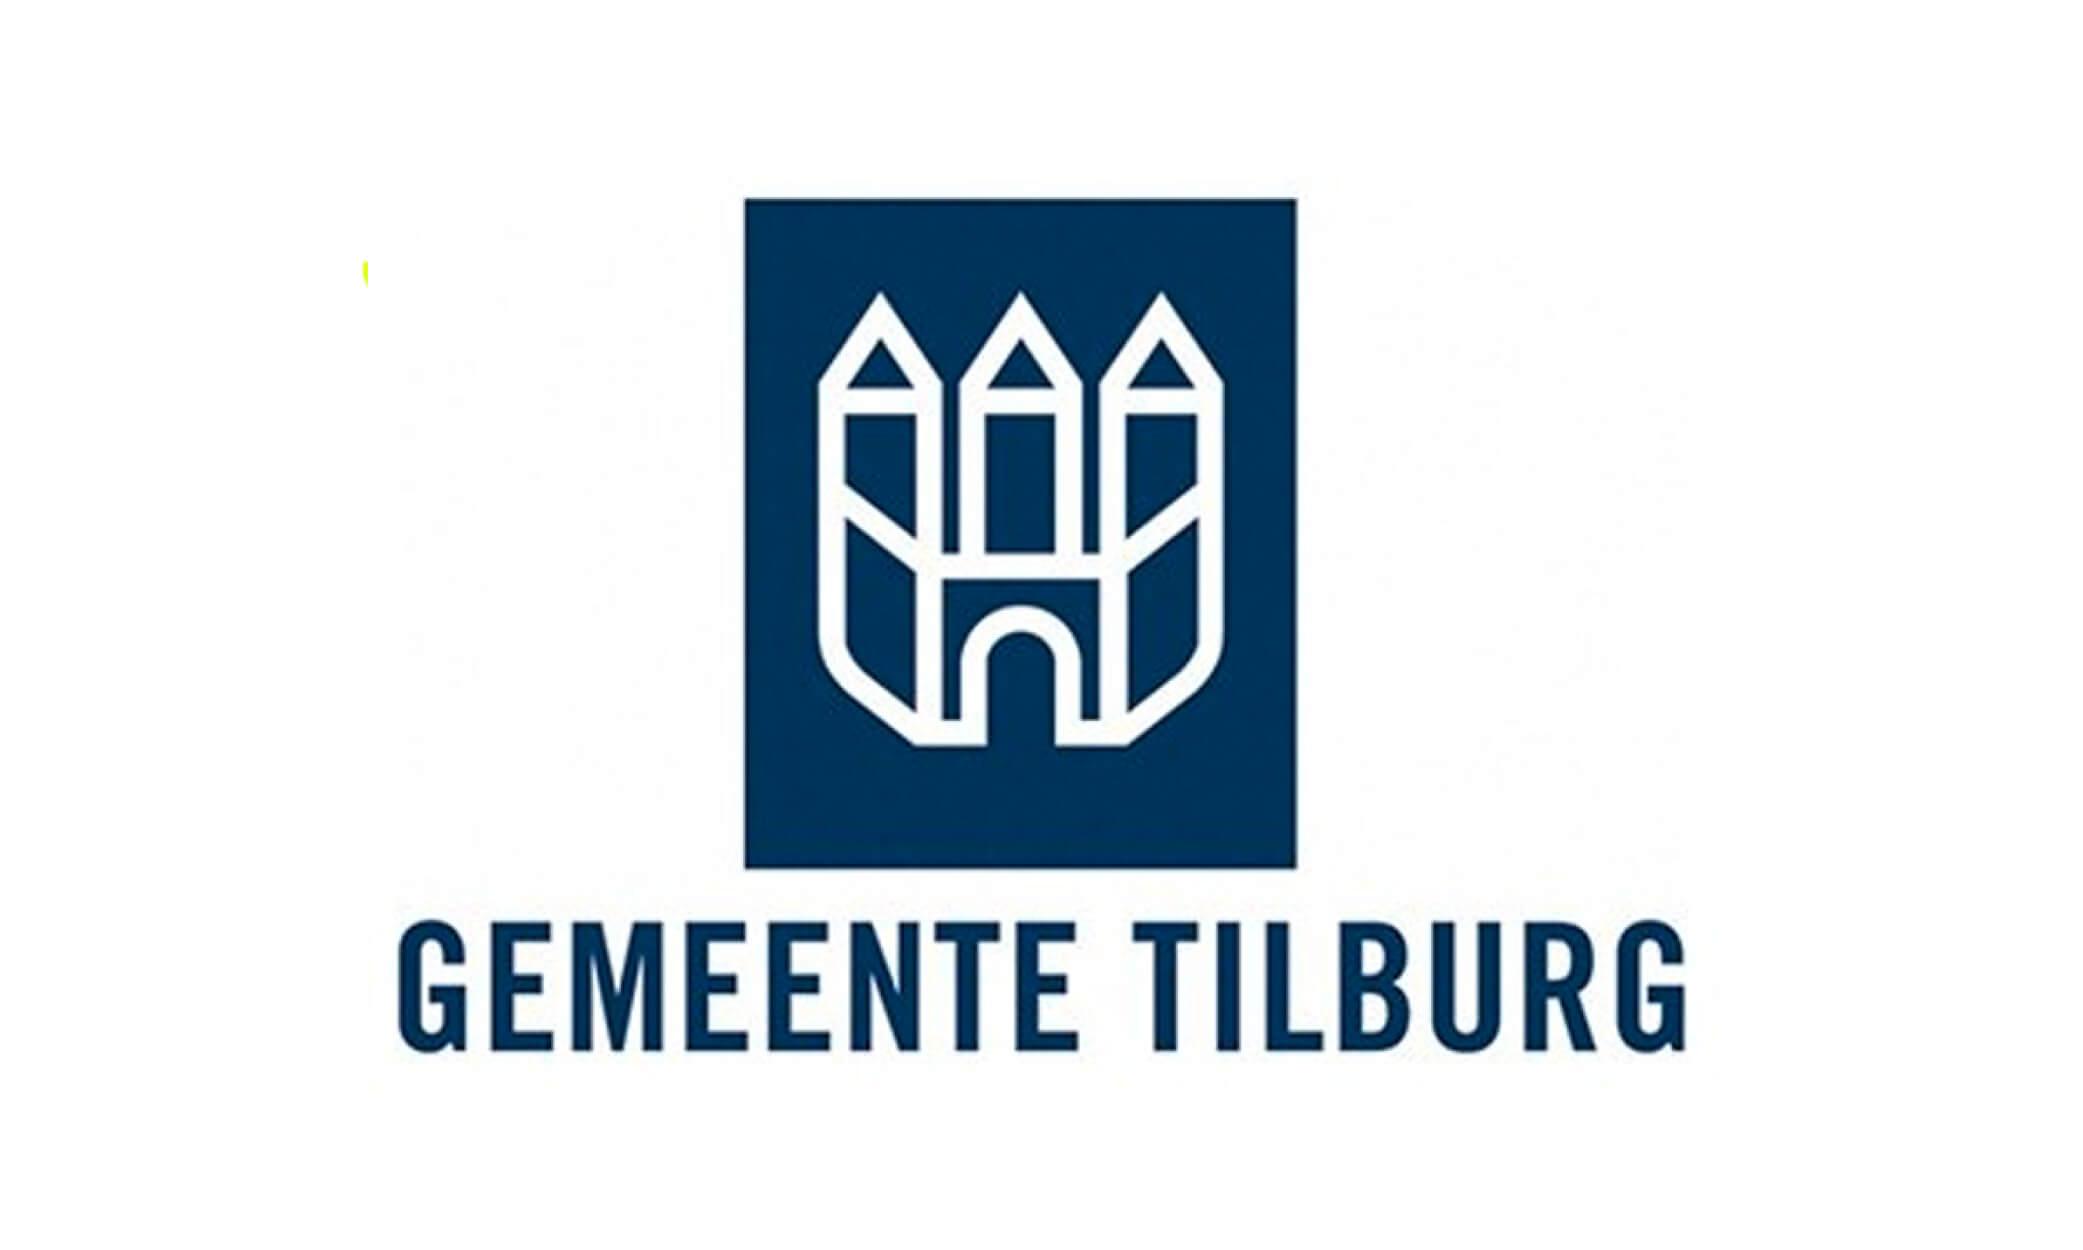 Gemeente Tilburg Starterslift